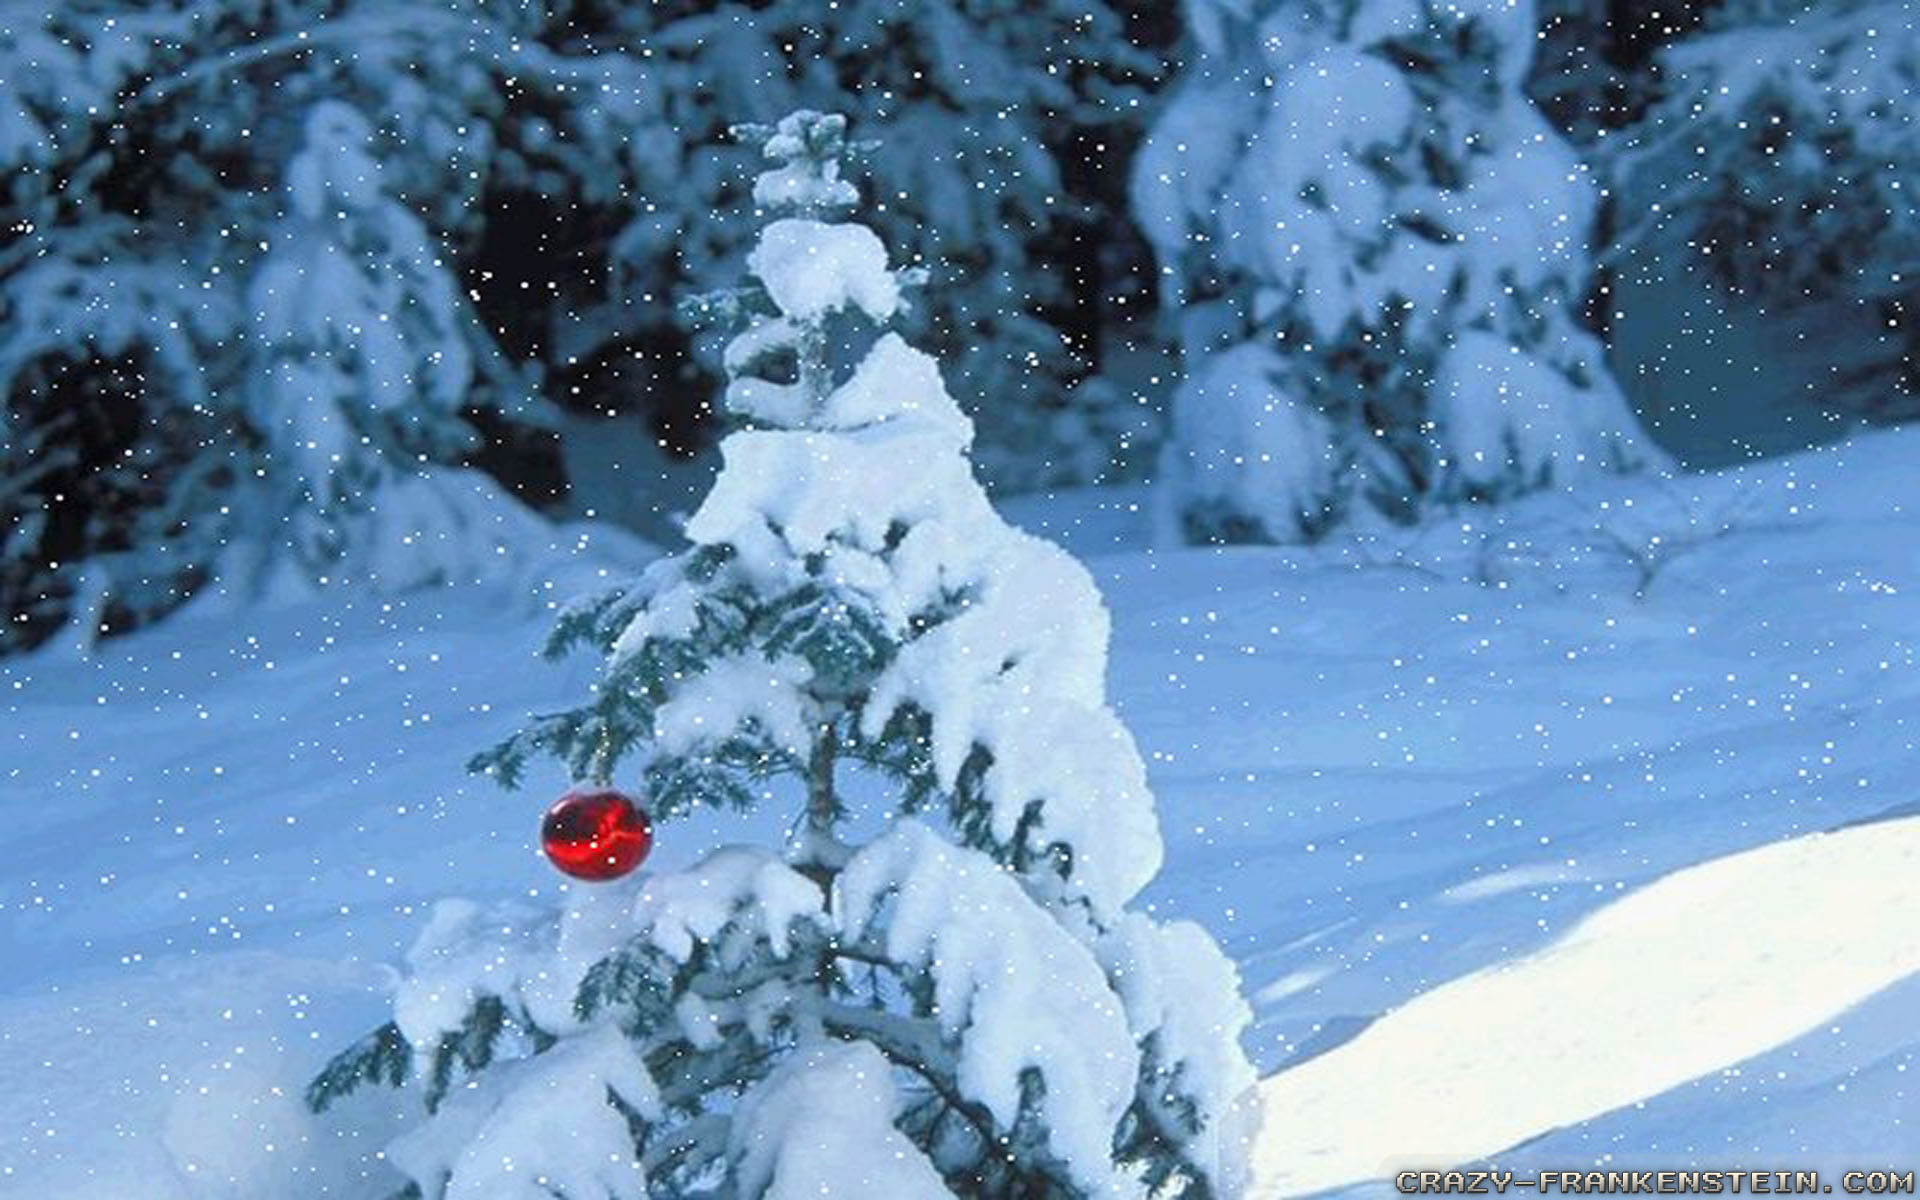 Res: 1920x1200, Wallpaper: Tree decoration Winter Scenes Resolution: 1024x768 | 1280x1024 |  1600x1200. Widescreen Res: 1440x900 | 1680x1050 |